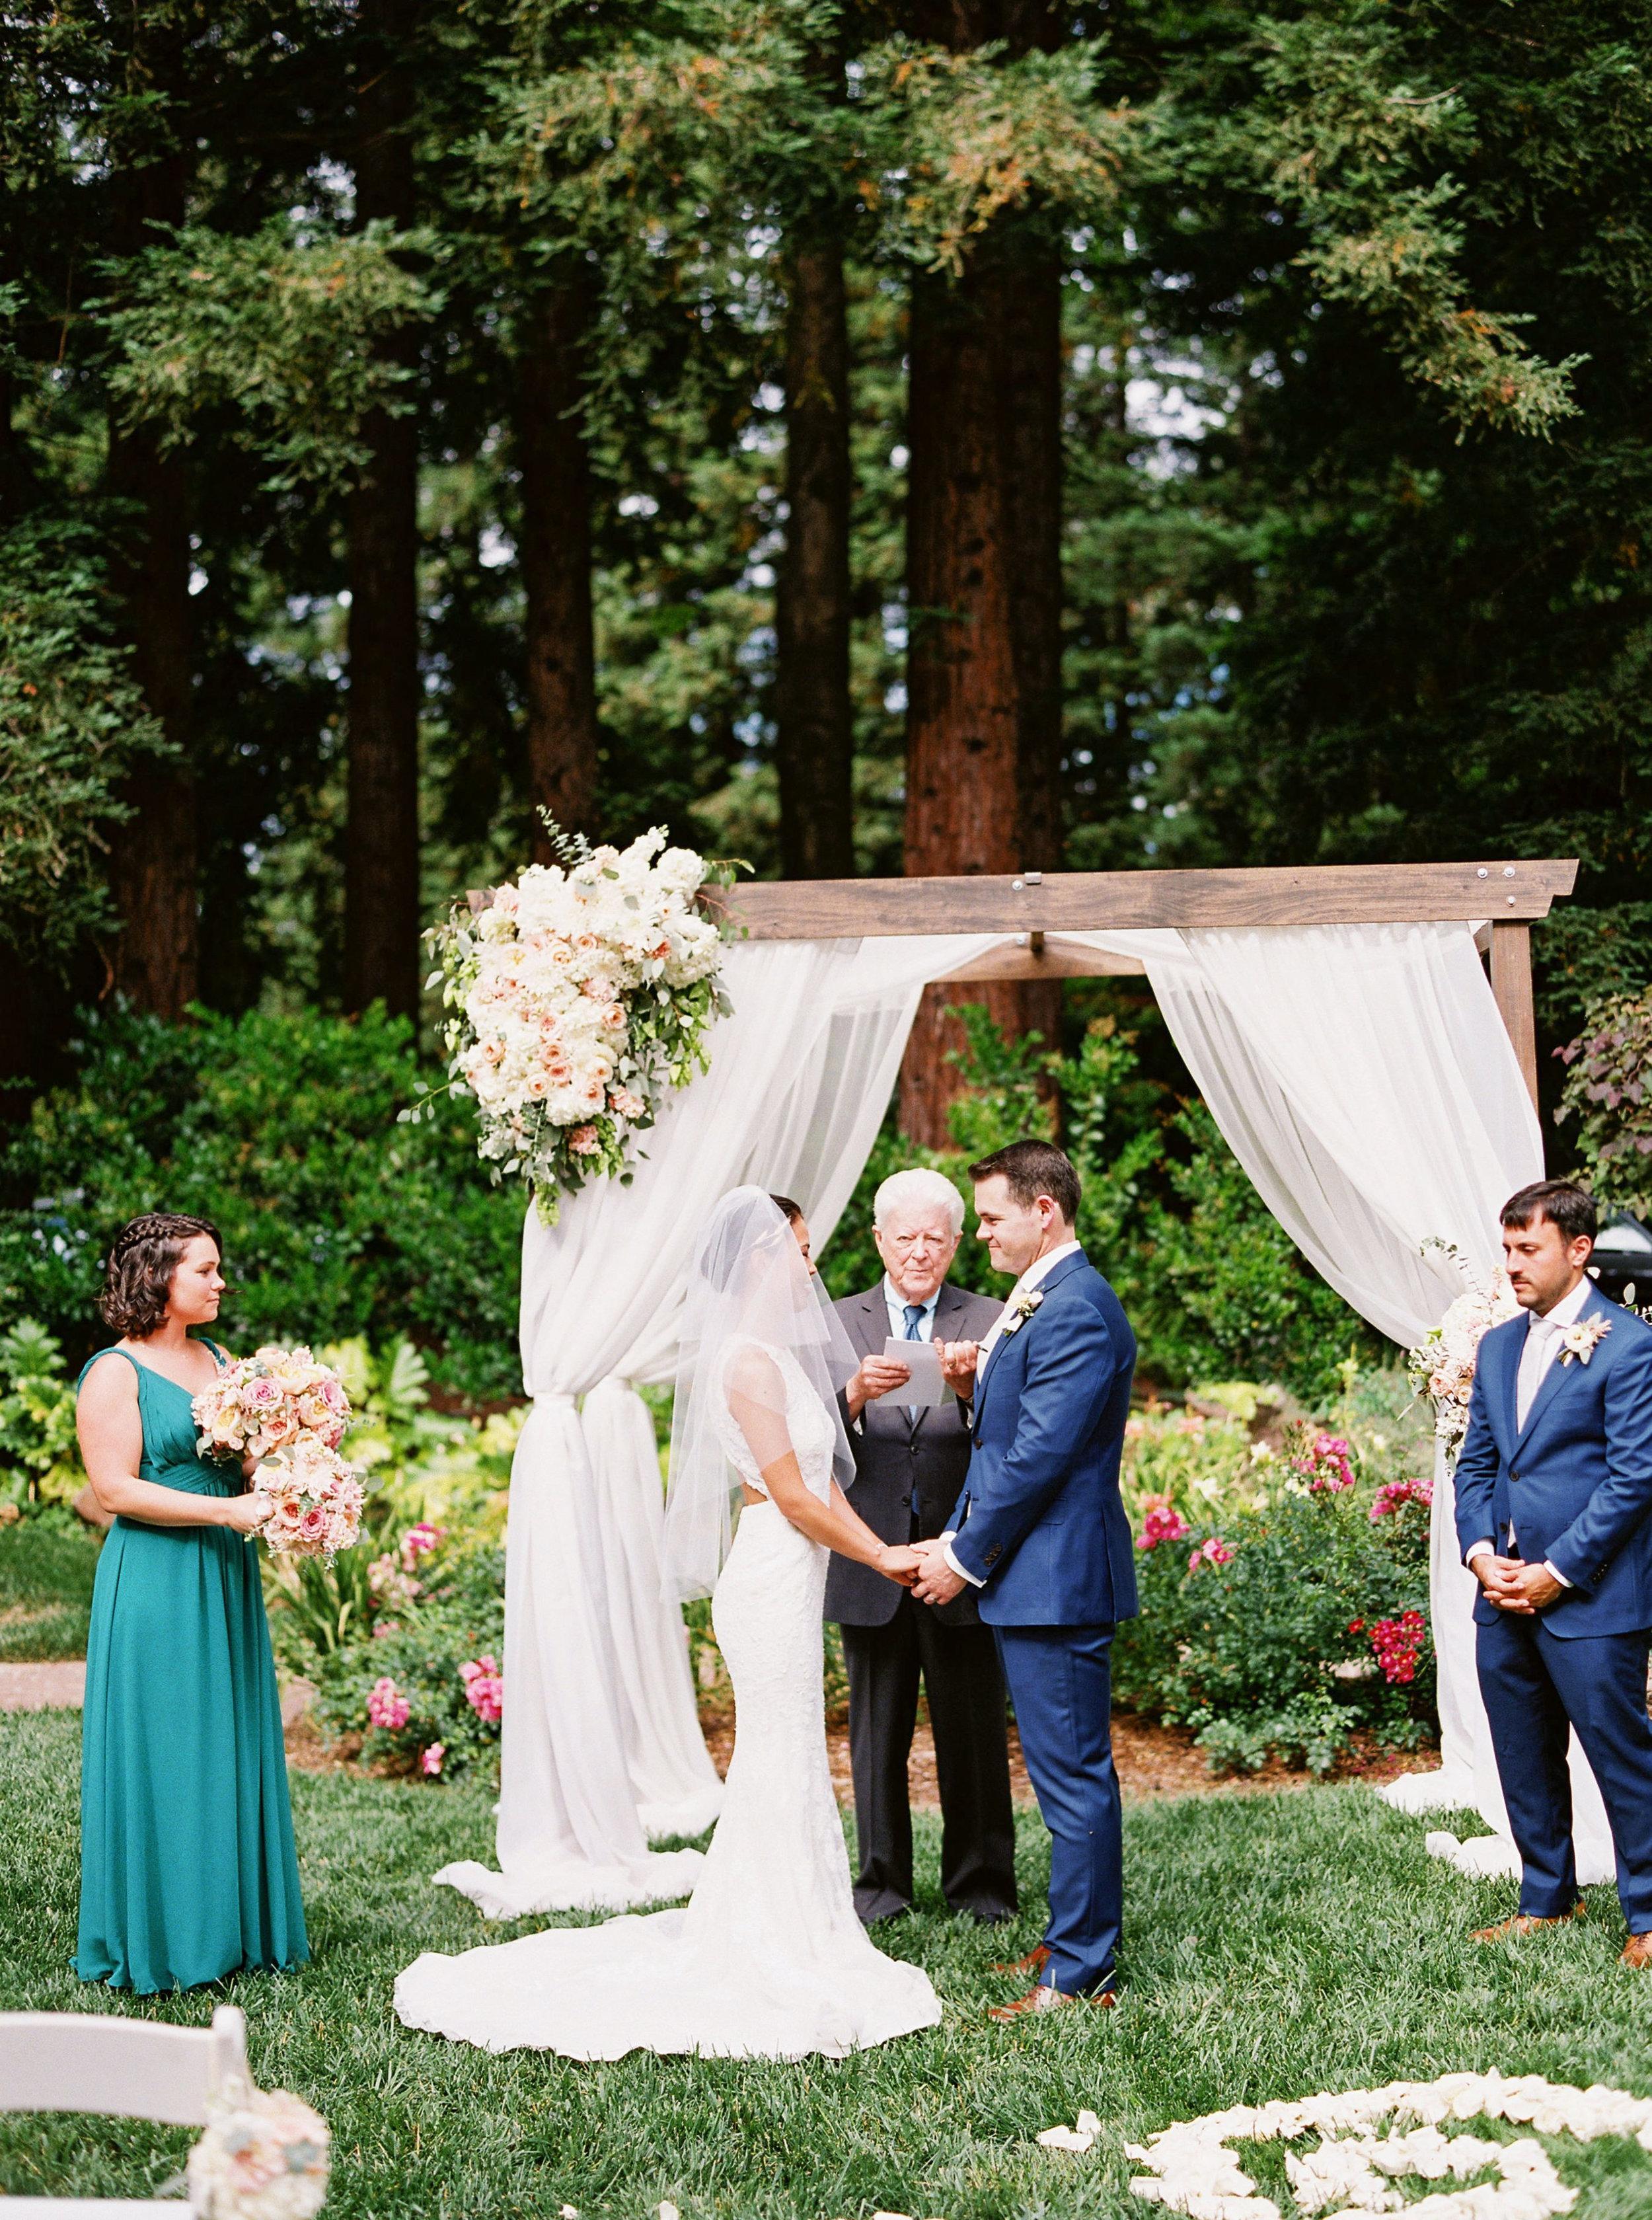 Harvest-inn-wedding-in-napa-california-71.jpg